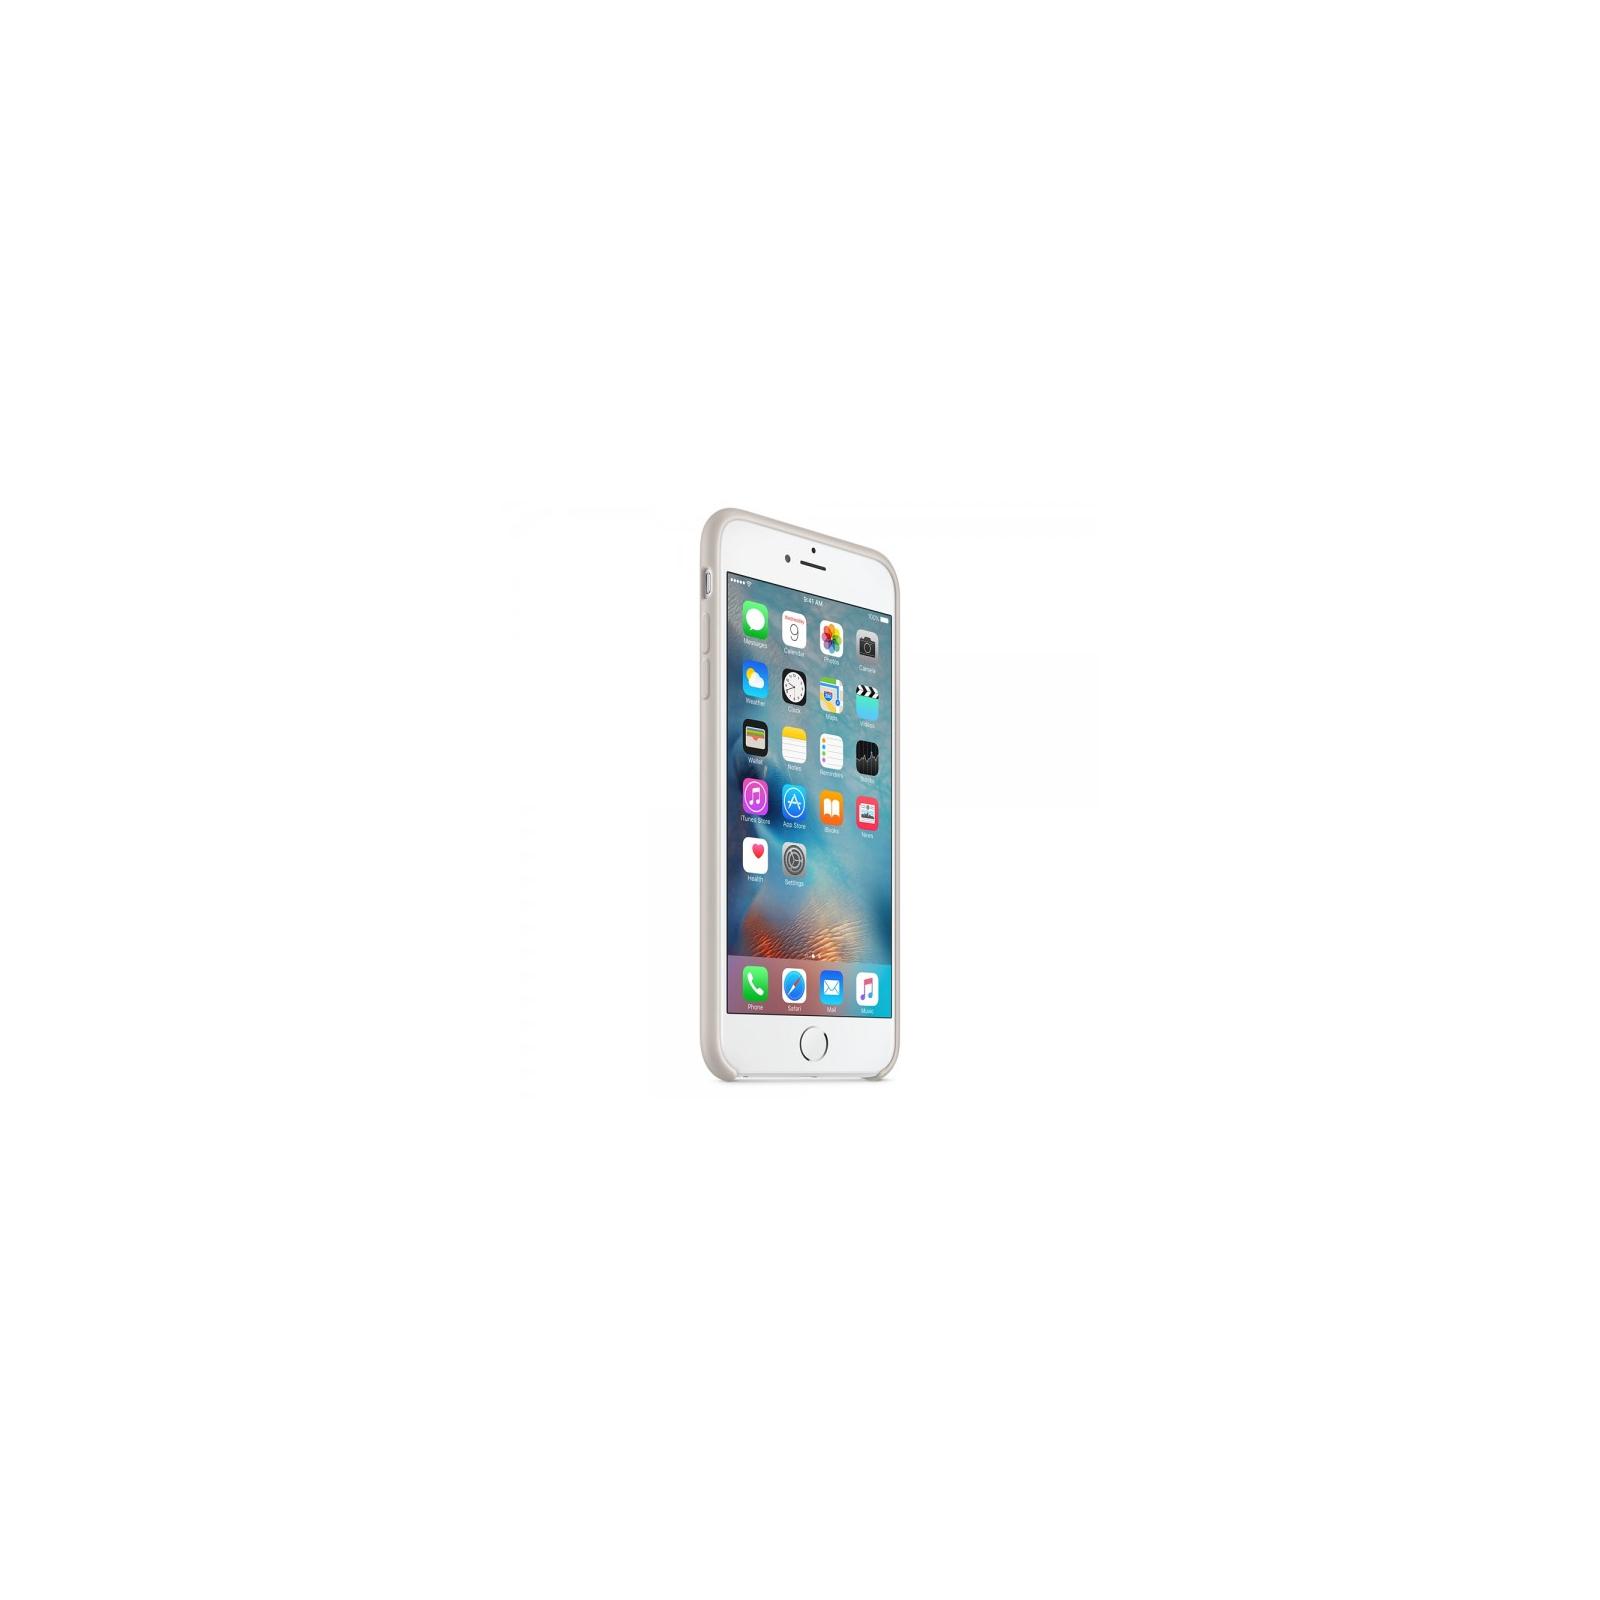 Чехол для моб. телефона Apple для iPhone 6 Plus/6s Plus Stone (MKXN2ZM/A) изображение 4